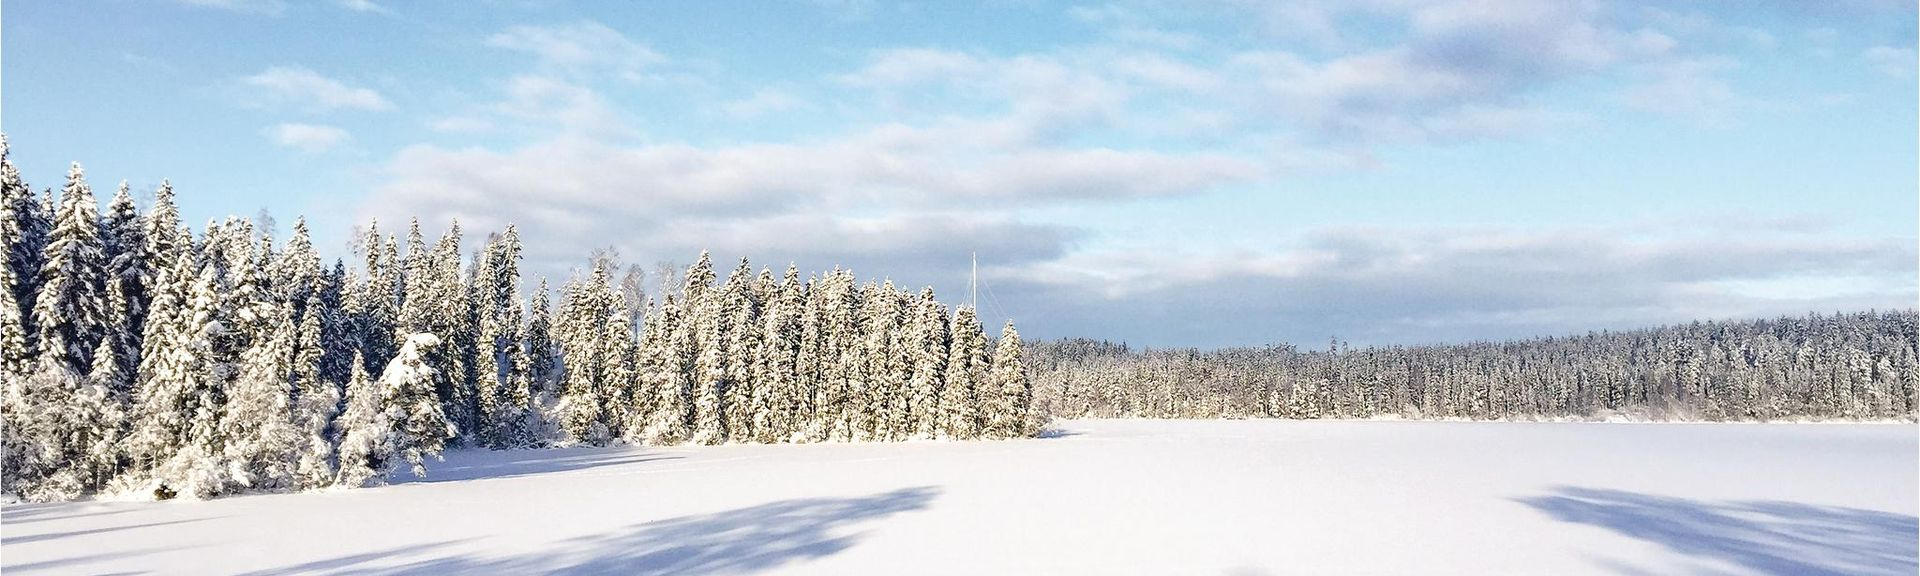 Vegby, Landeskreis Vastra Gotaland, Schweden